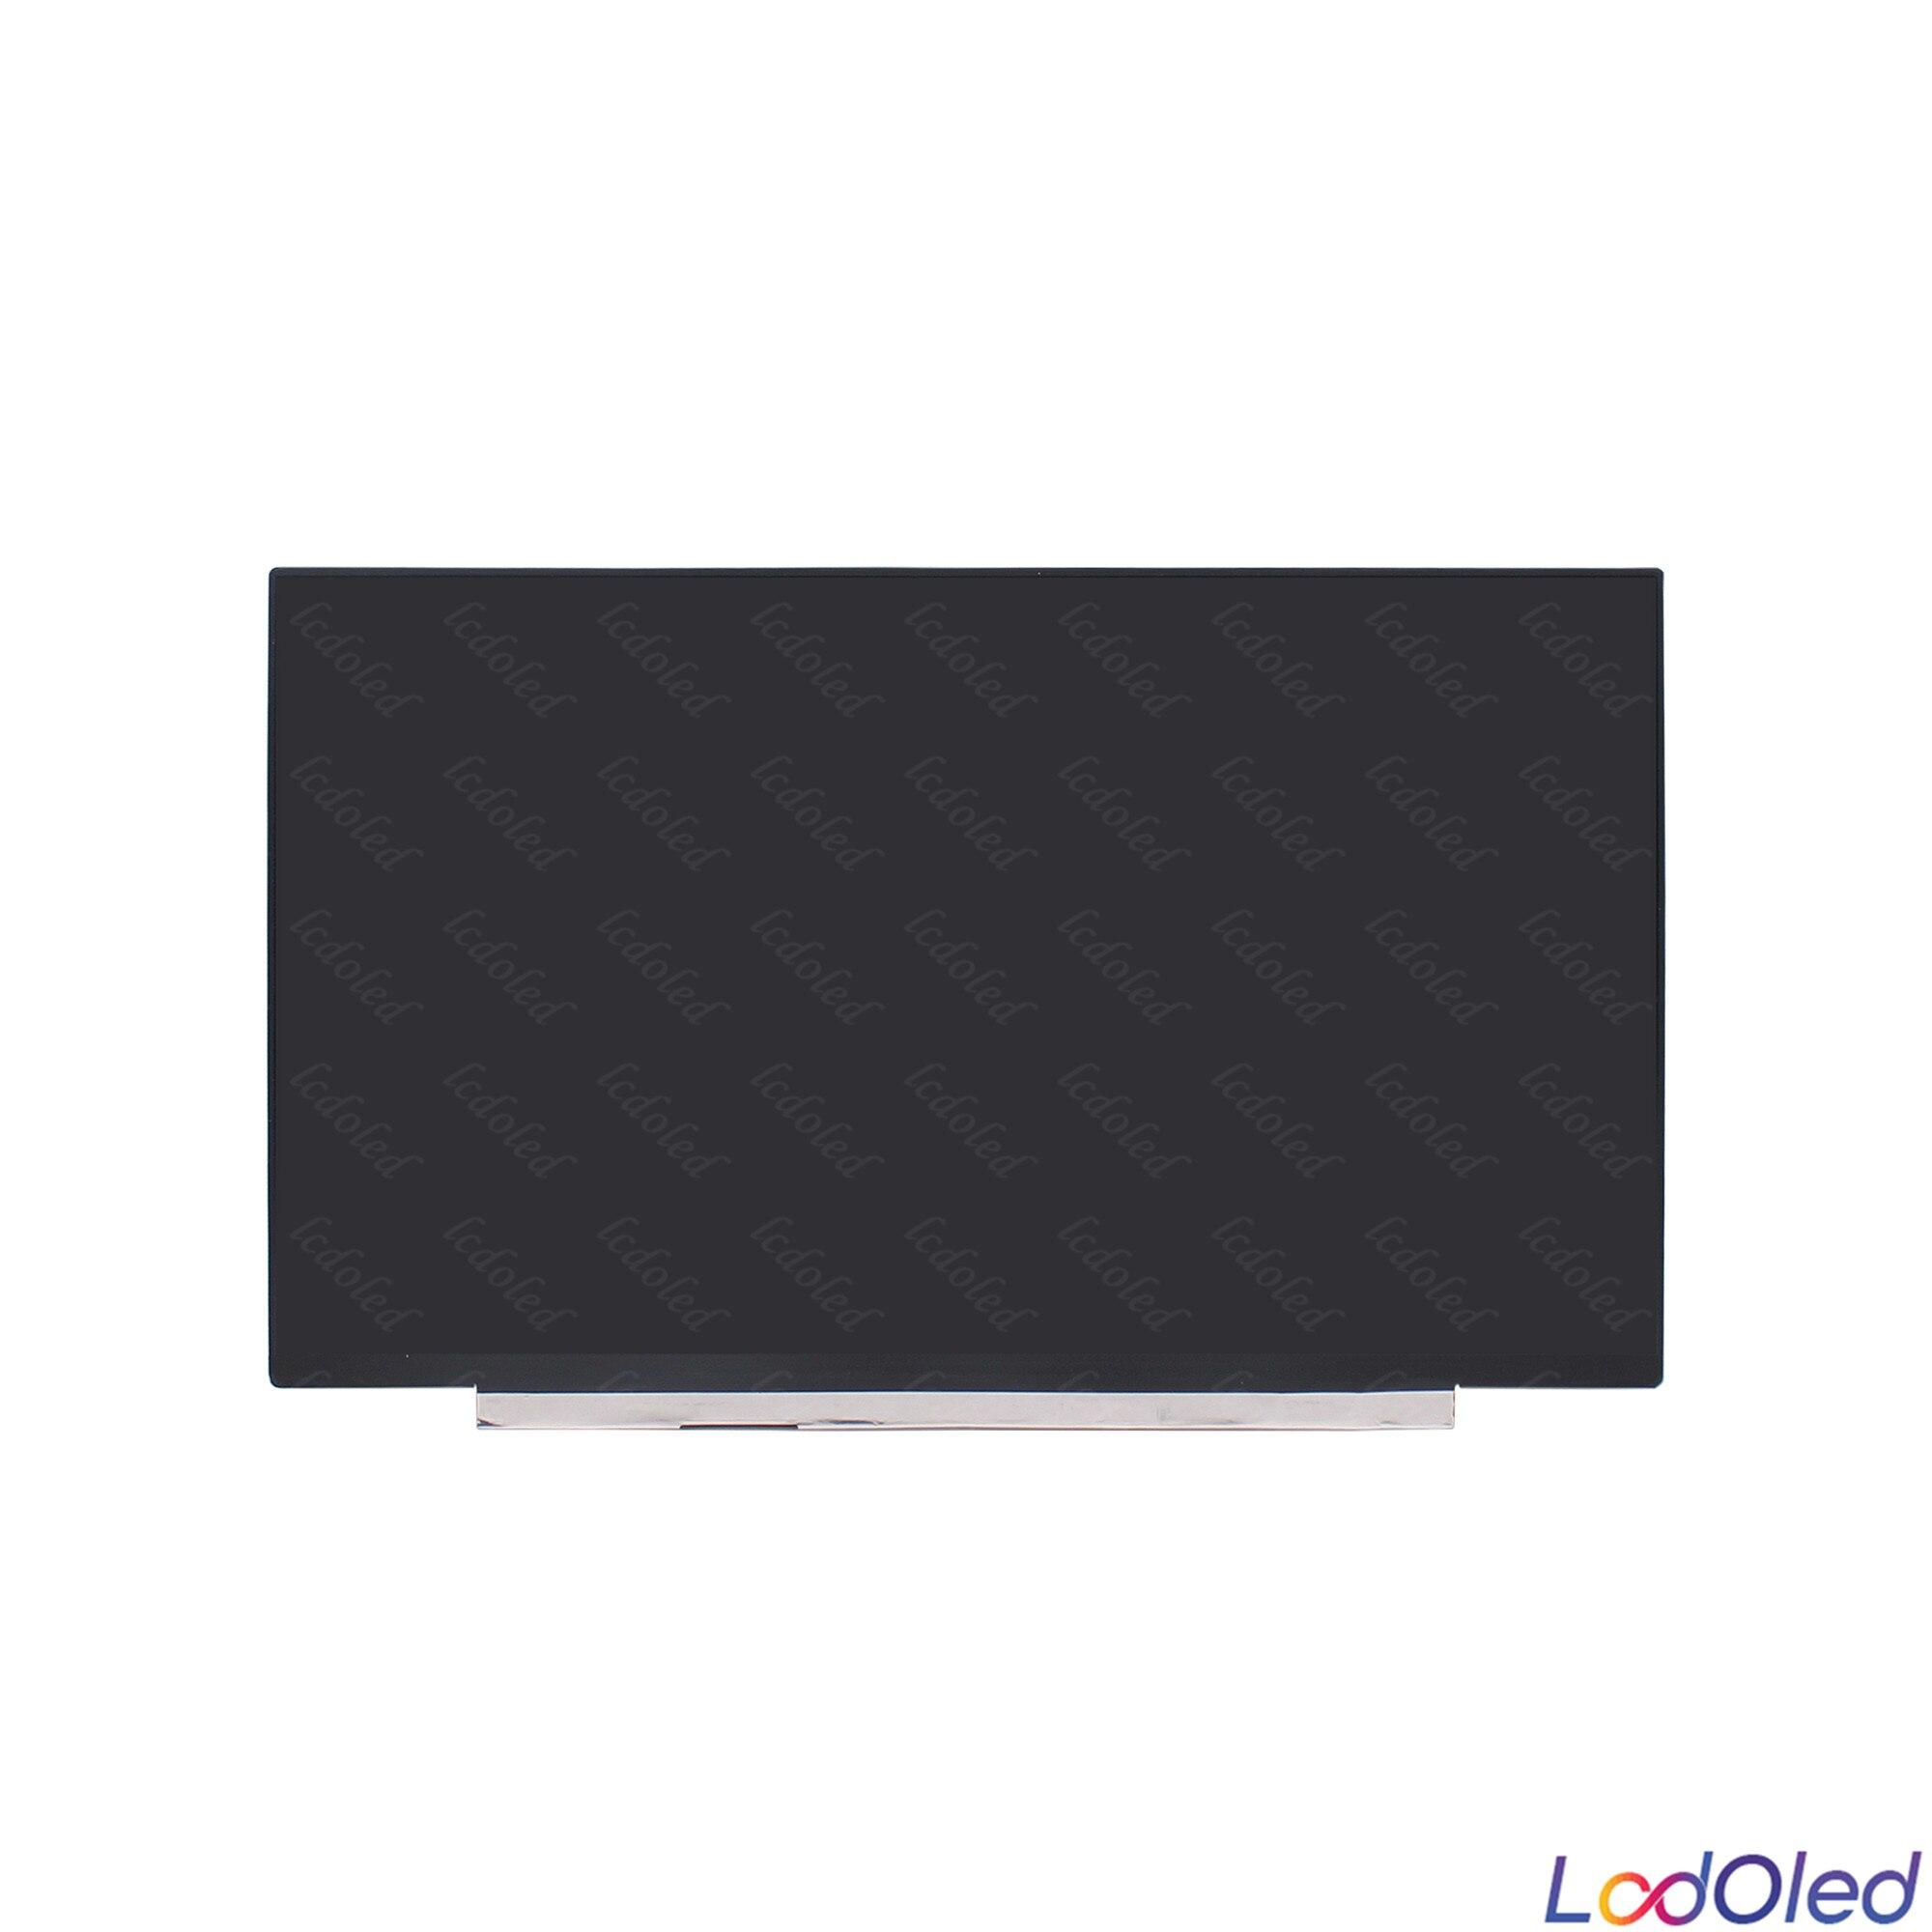 14.0'' FHD IPS LCD Screen Display Panel Matrix N140HCR-GA2 NE140FHM-N61 B140HAN04.0 B140HAN05.7 N140HCG-GQ2 N140HCG-GR2 (Rev B1)